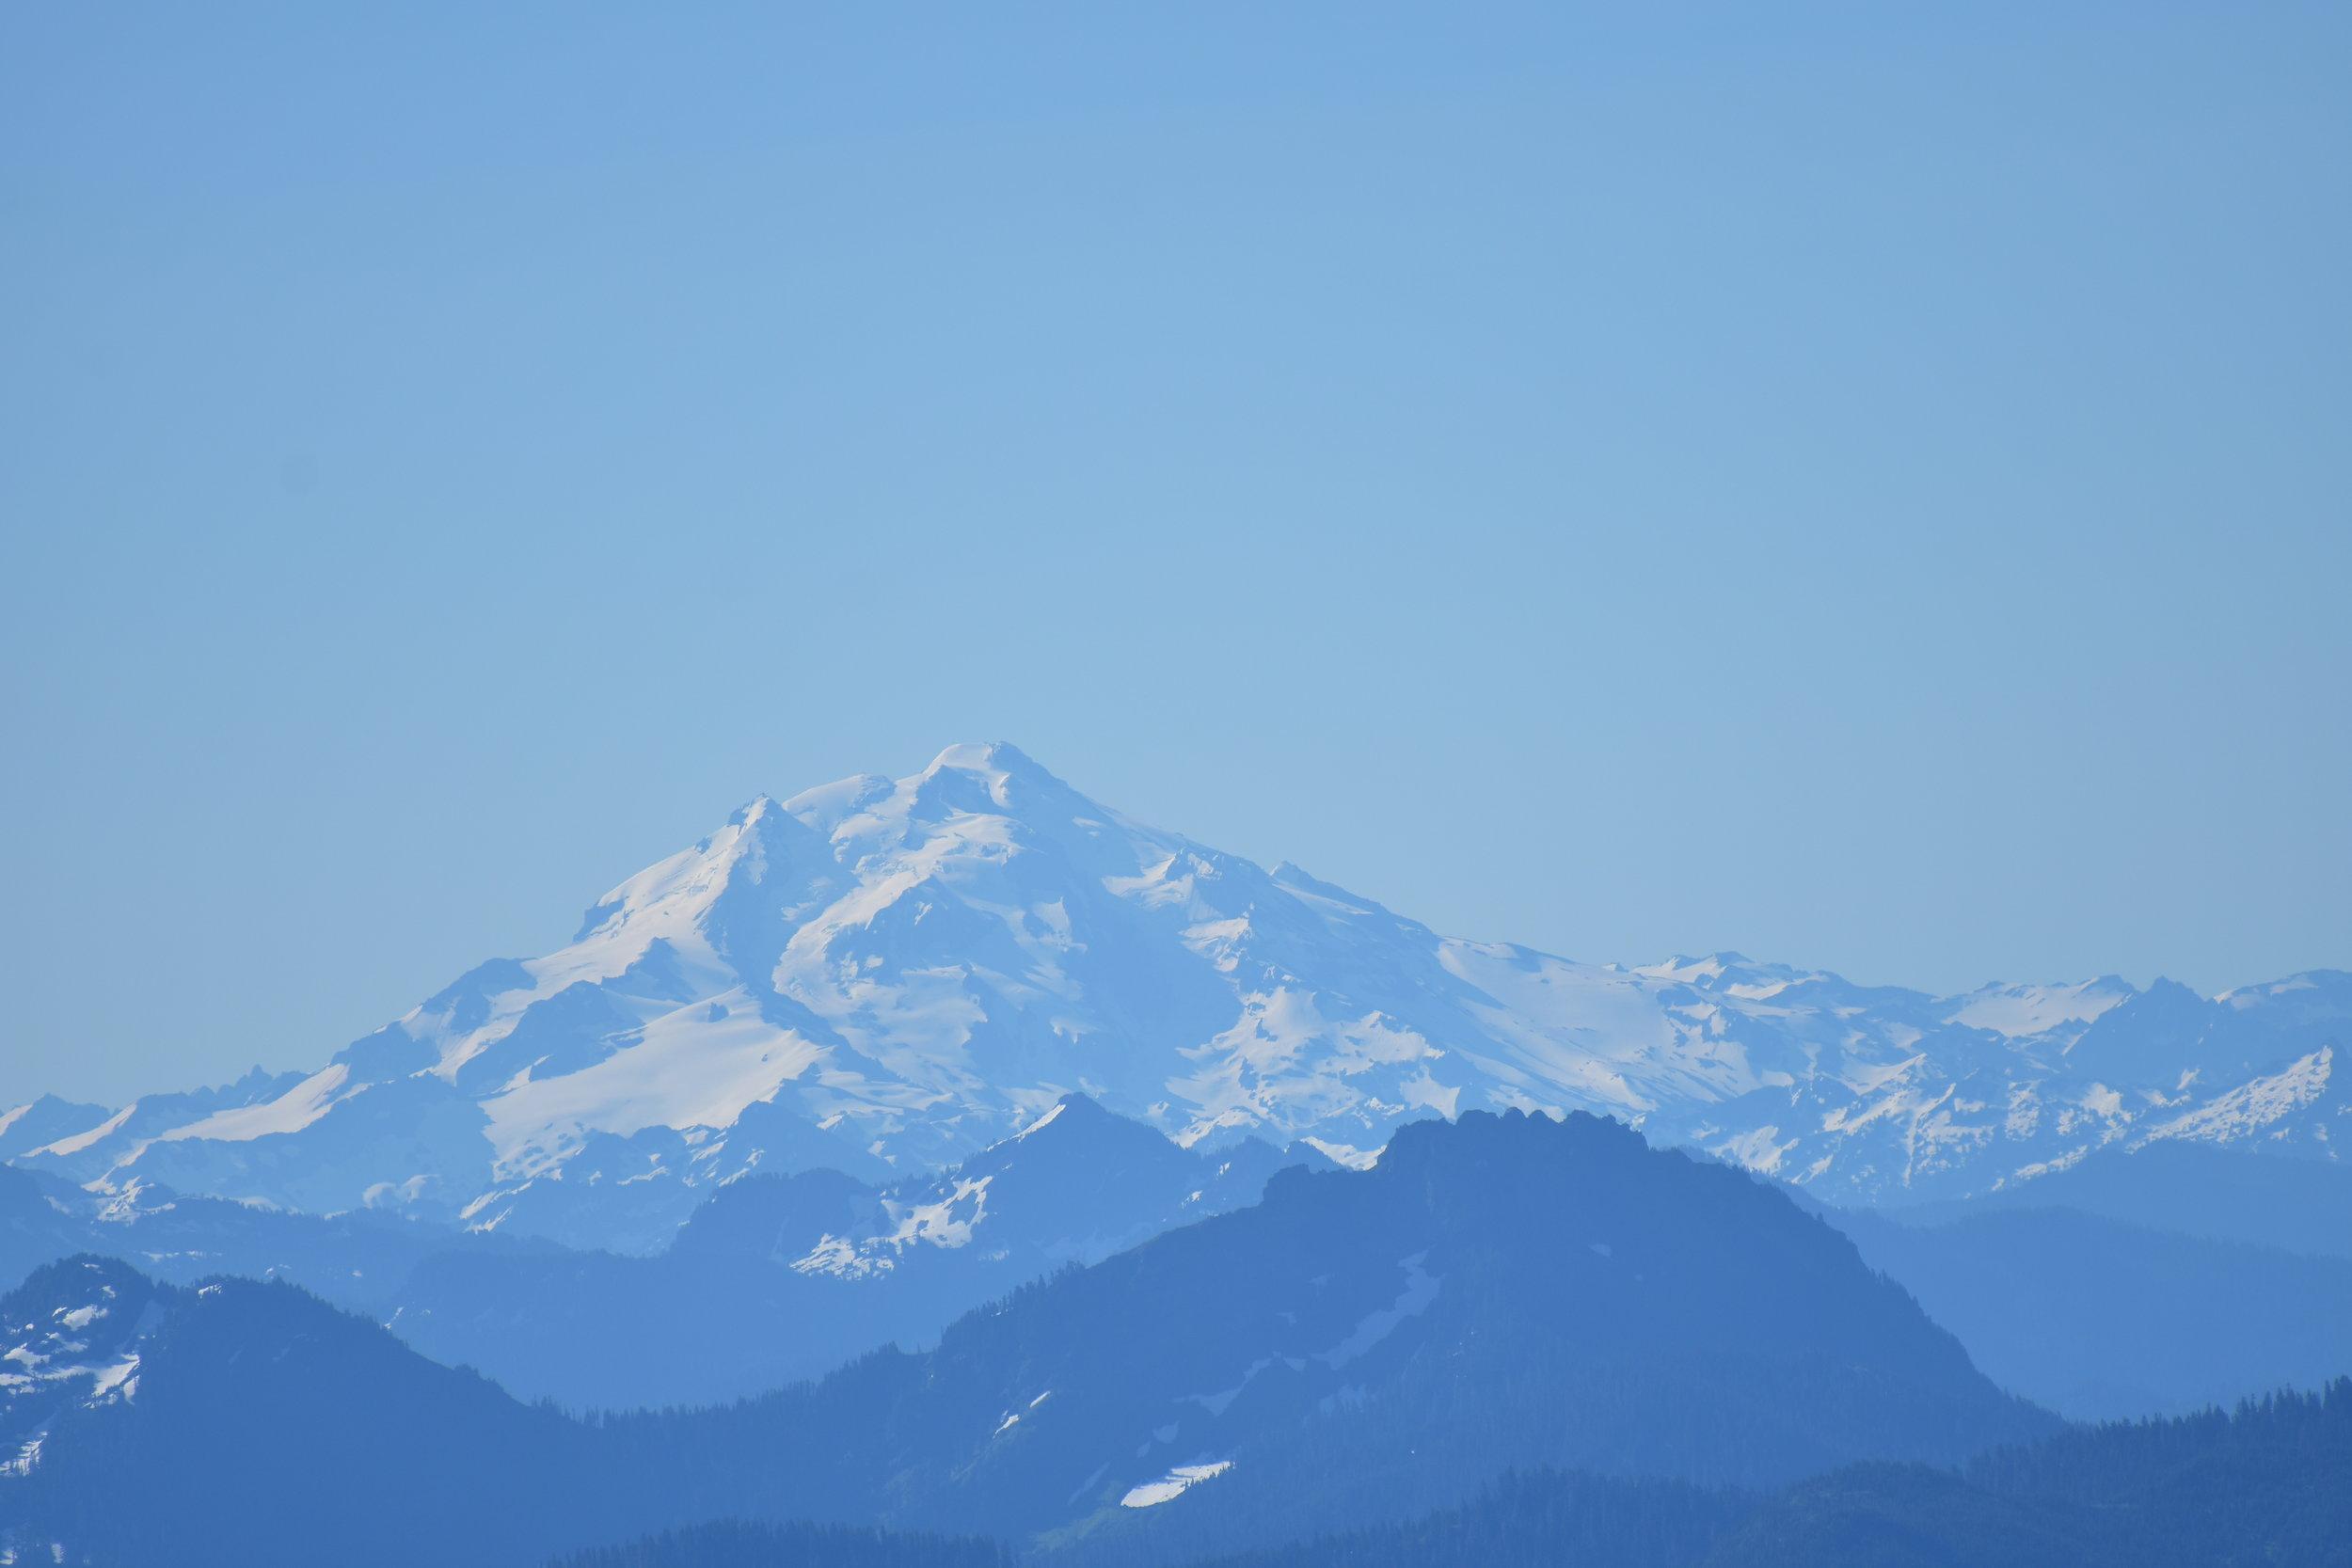 Glacier Peak from Mt. Baker